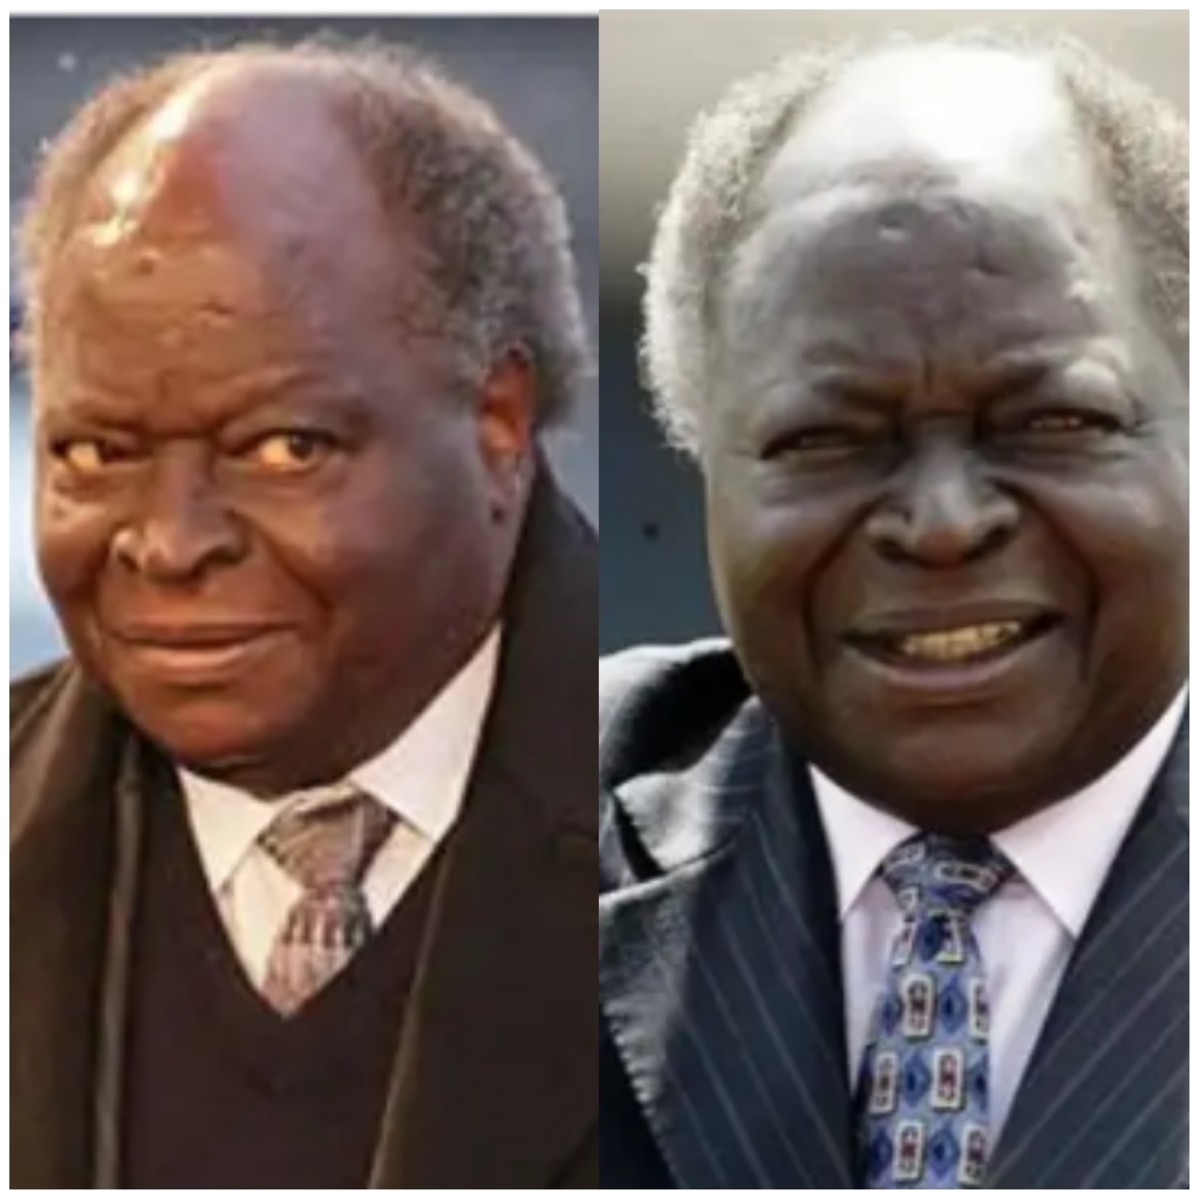 Mwai Kibaki: The Third President of Kenya